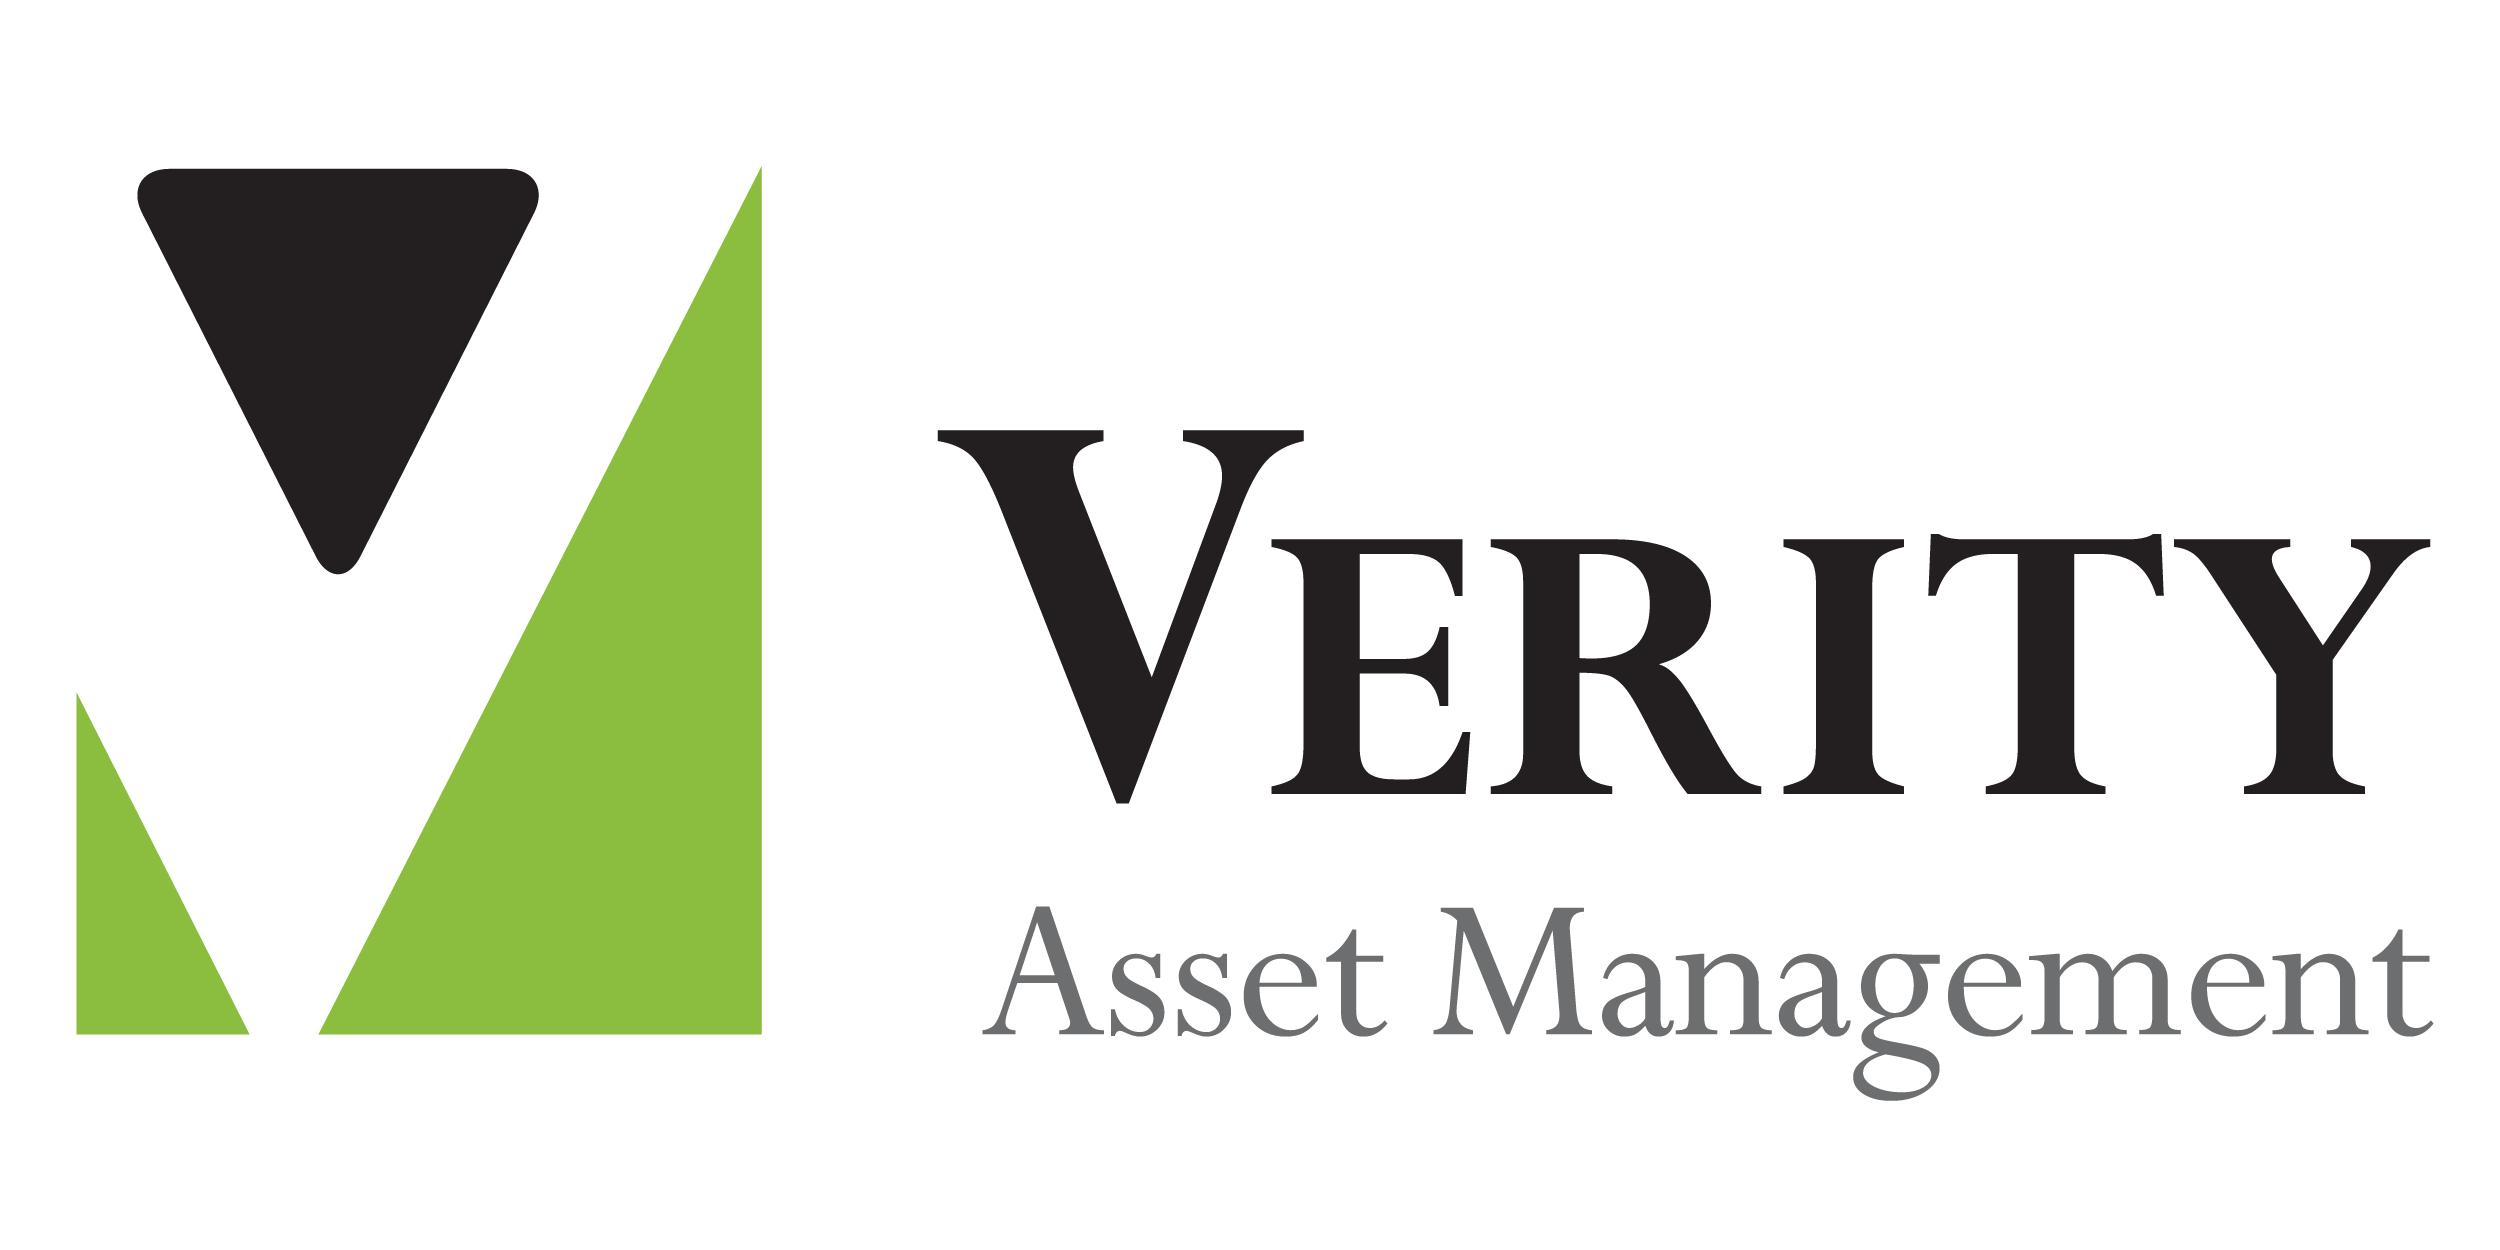 Verity Asset Management